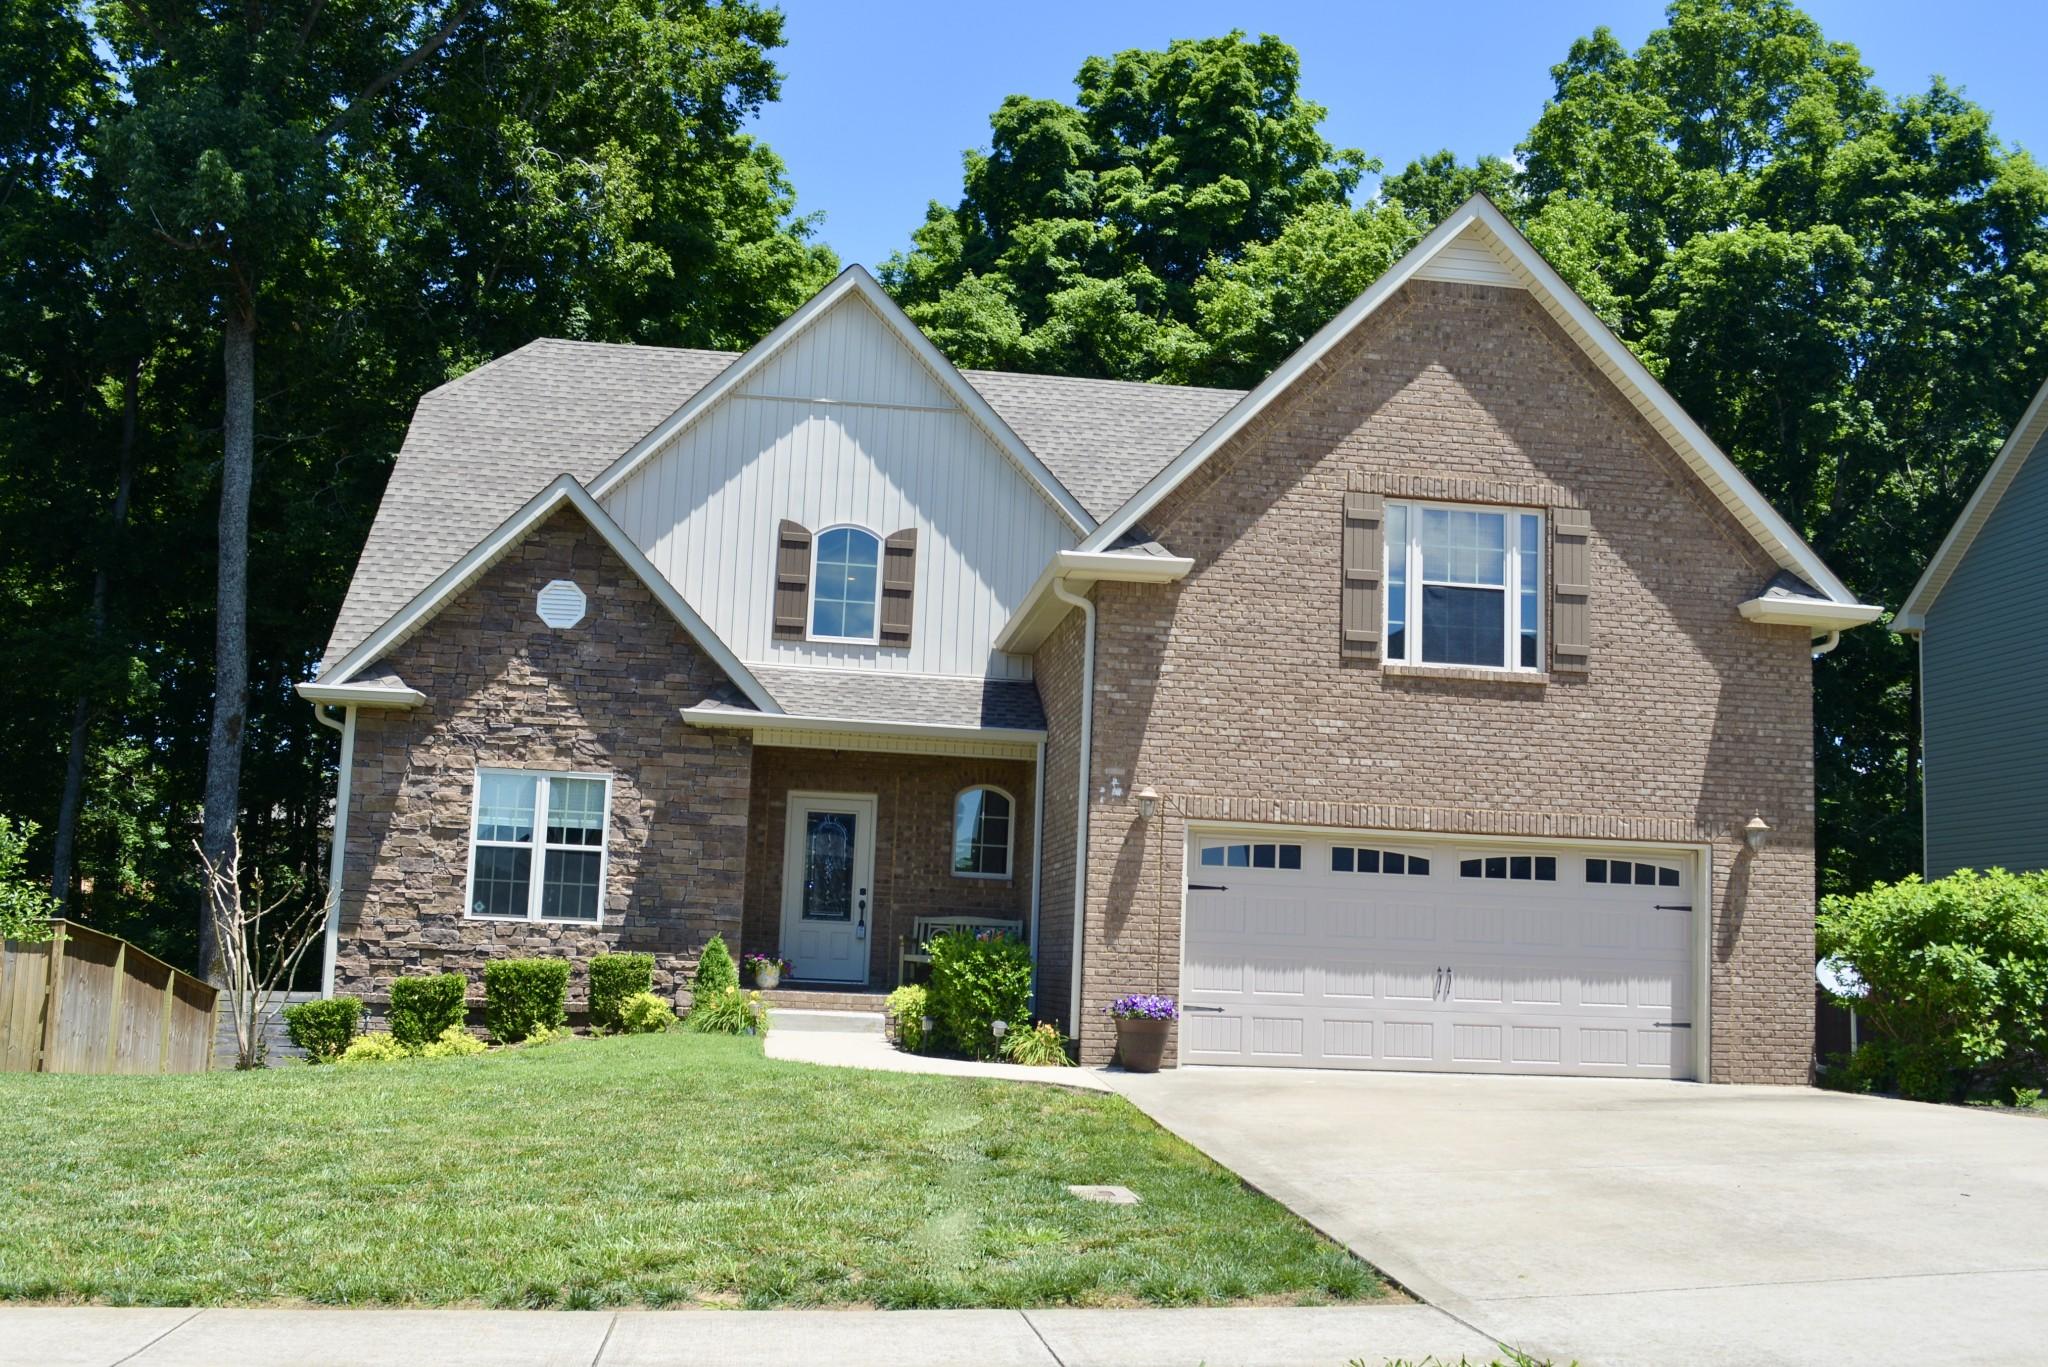 348 Abeline Dr Property Photo - Clarksville, TN real estate listing